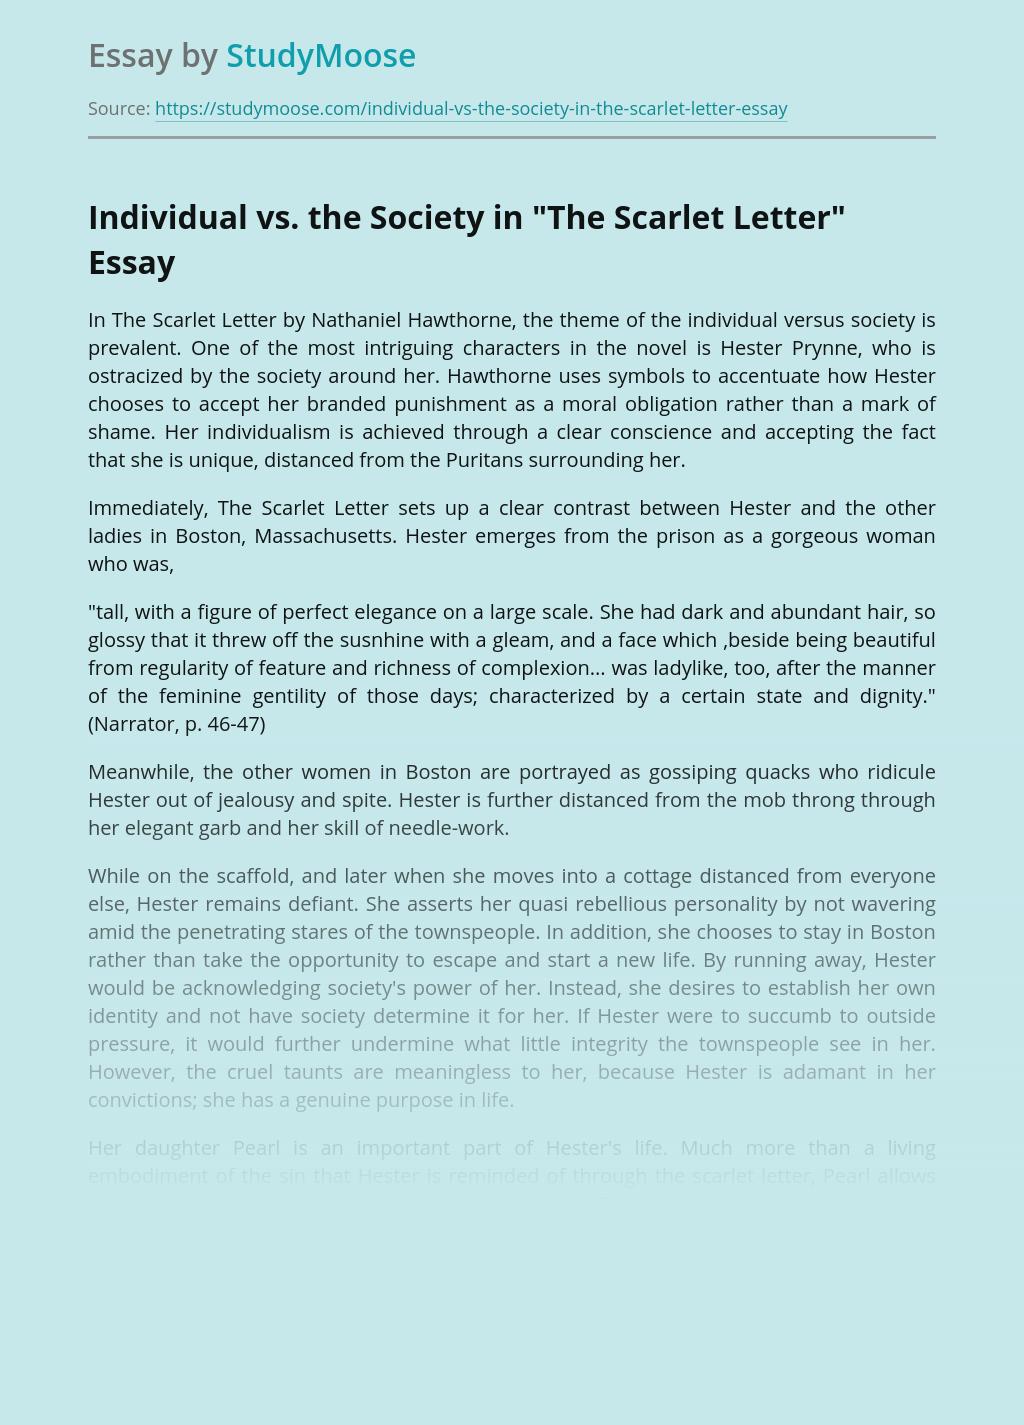 Individual vs. the Society in